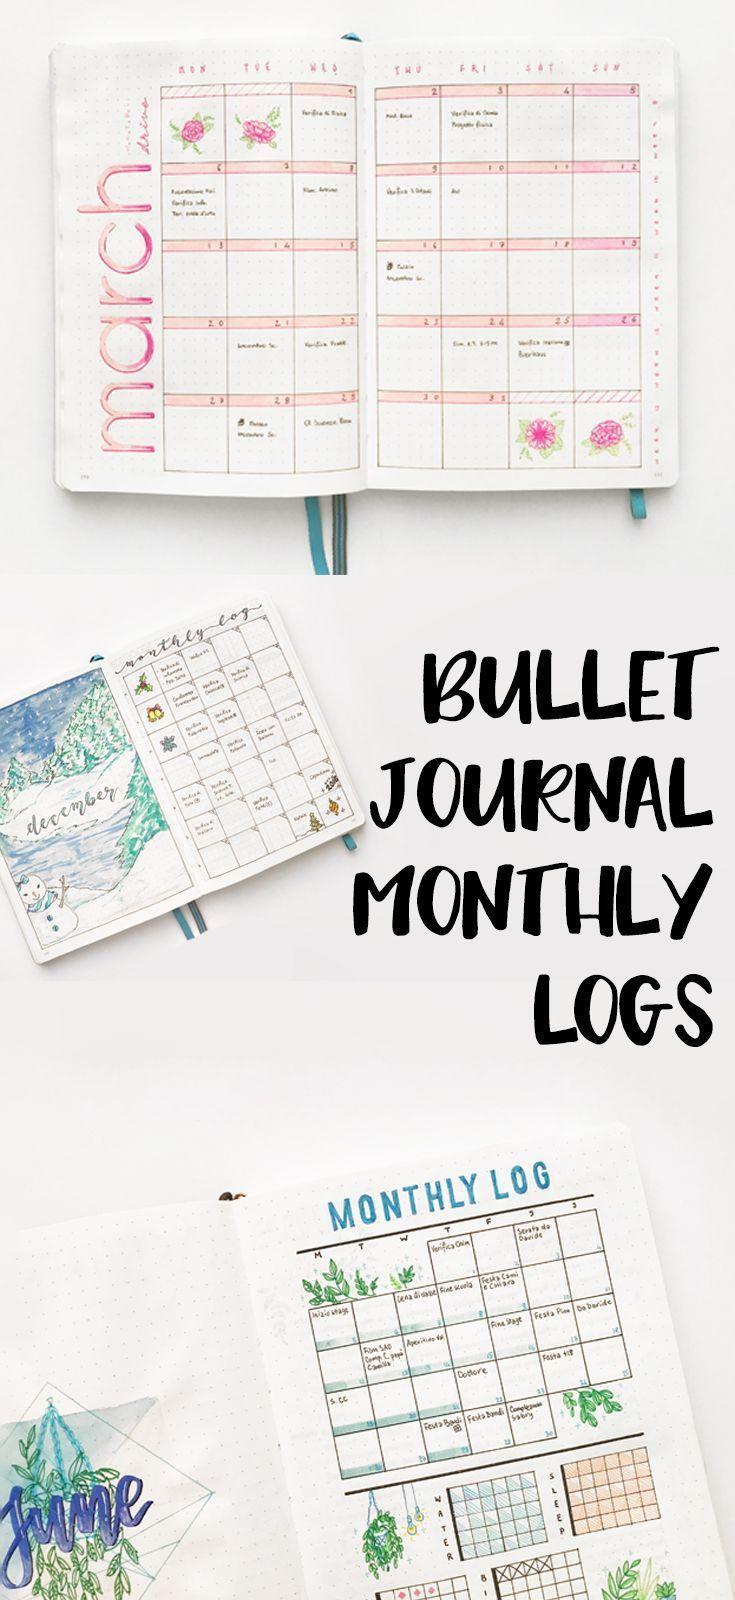 Different Types of Bullet Journal Monthly Logs  #bulletjournal